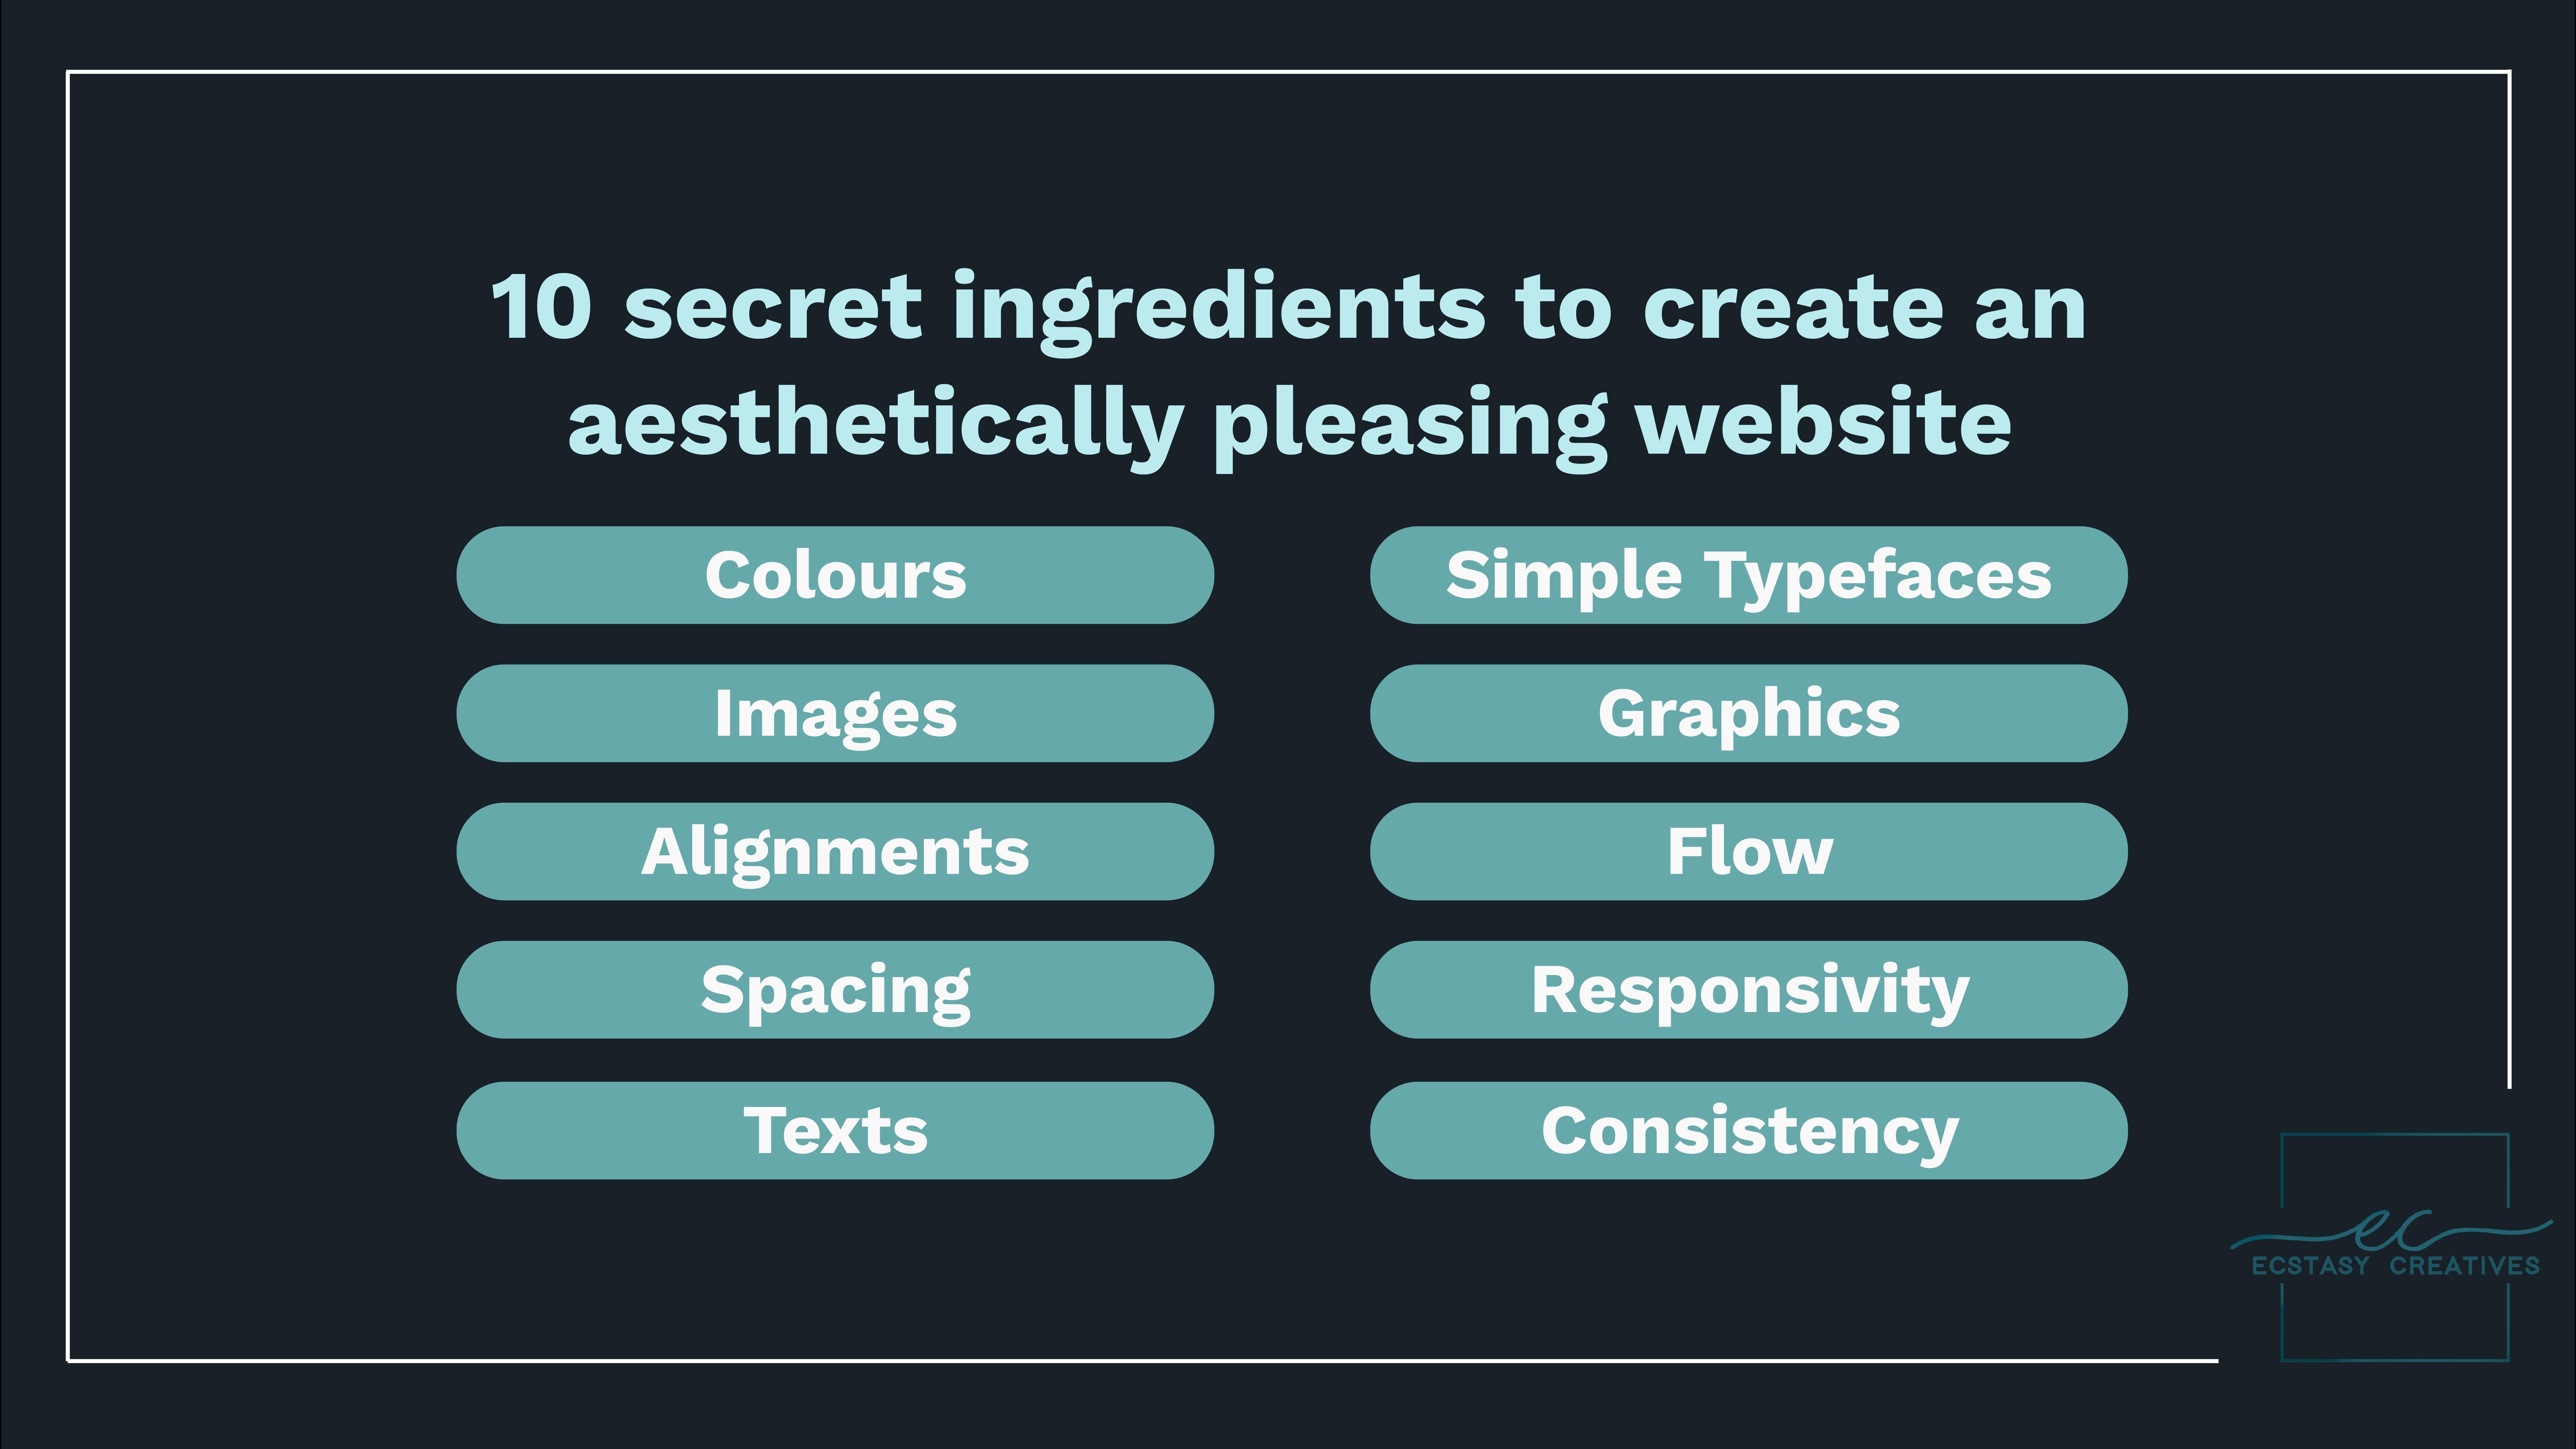 10 secret ingredients to create an aesthetically pleasing website